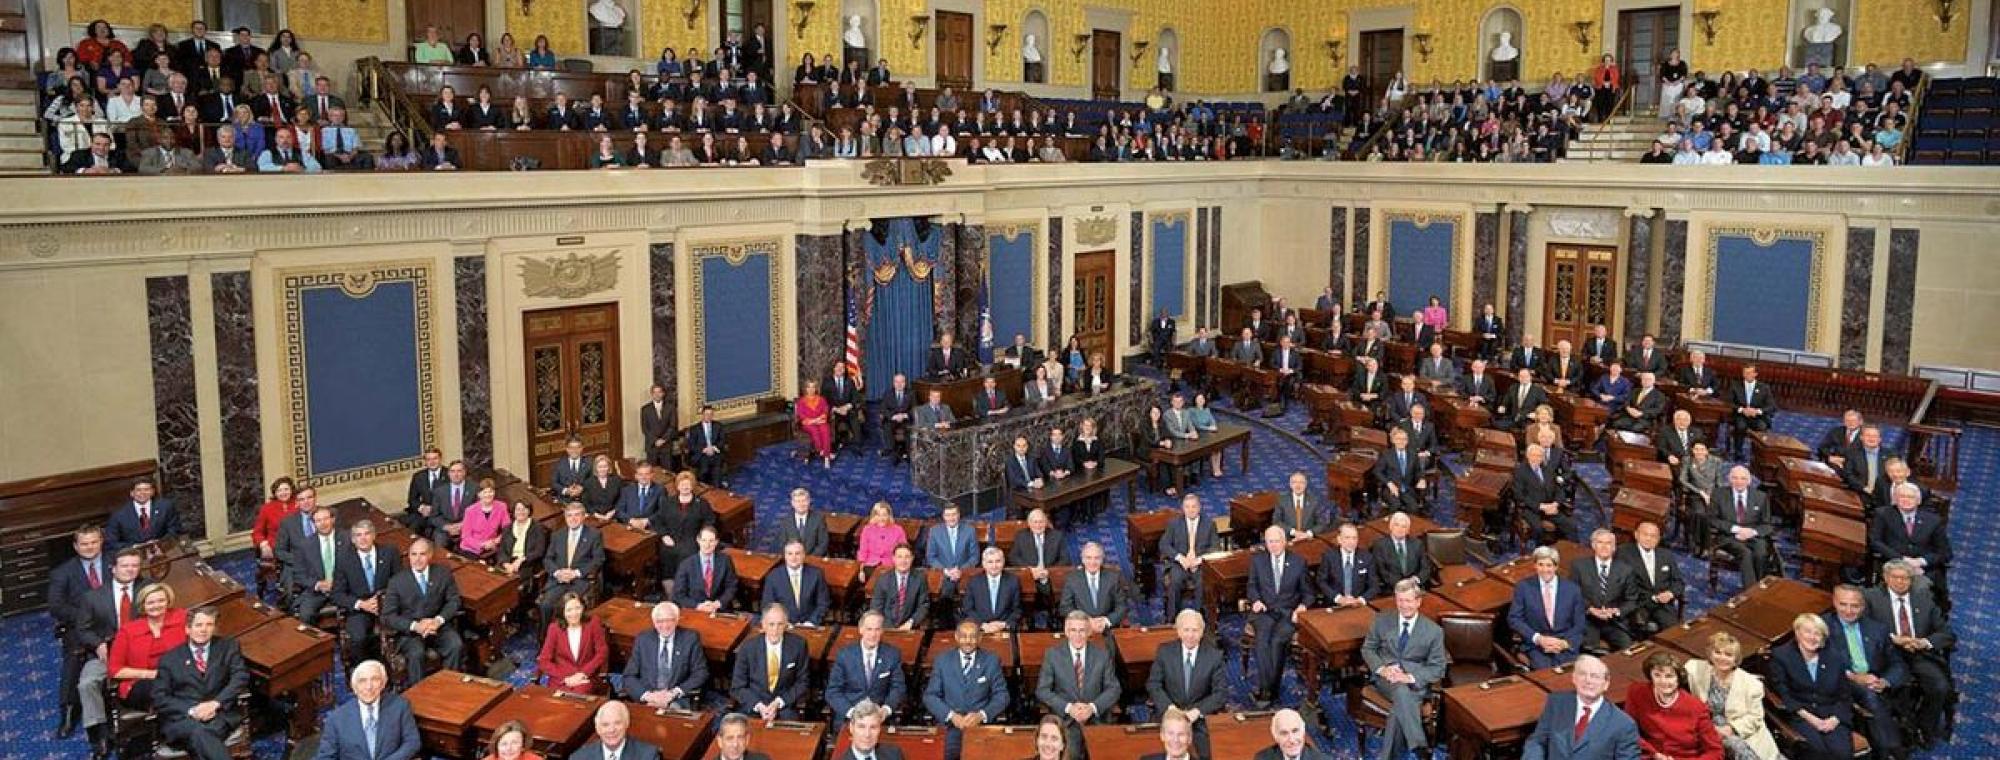 """111th US Senate class photo"" by U.S. Senate, 111th Congress, Senate Photo Studio - http://media-3.web.britannica.com/eb-media//97/149697-050-05A96268.jpg. Licensed under Public Domain via Commons - https://commons.wikimedia.org/wiki/File:111th_US_Senate_class_photo.jpg#/media/File:111th_US_Senate_class_photo.jpg"